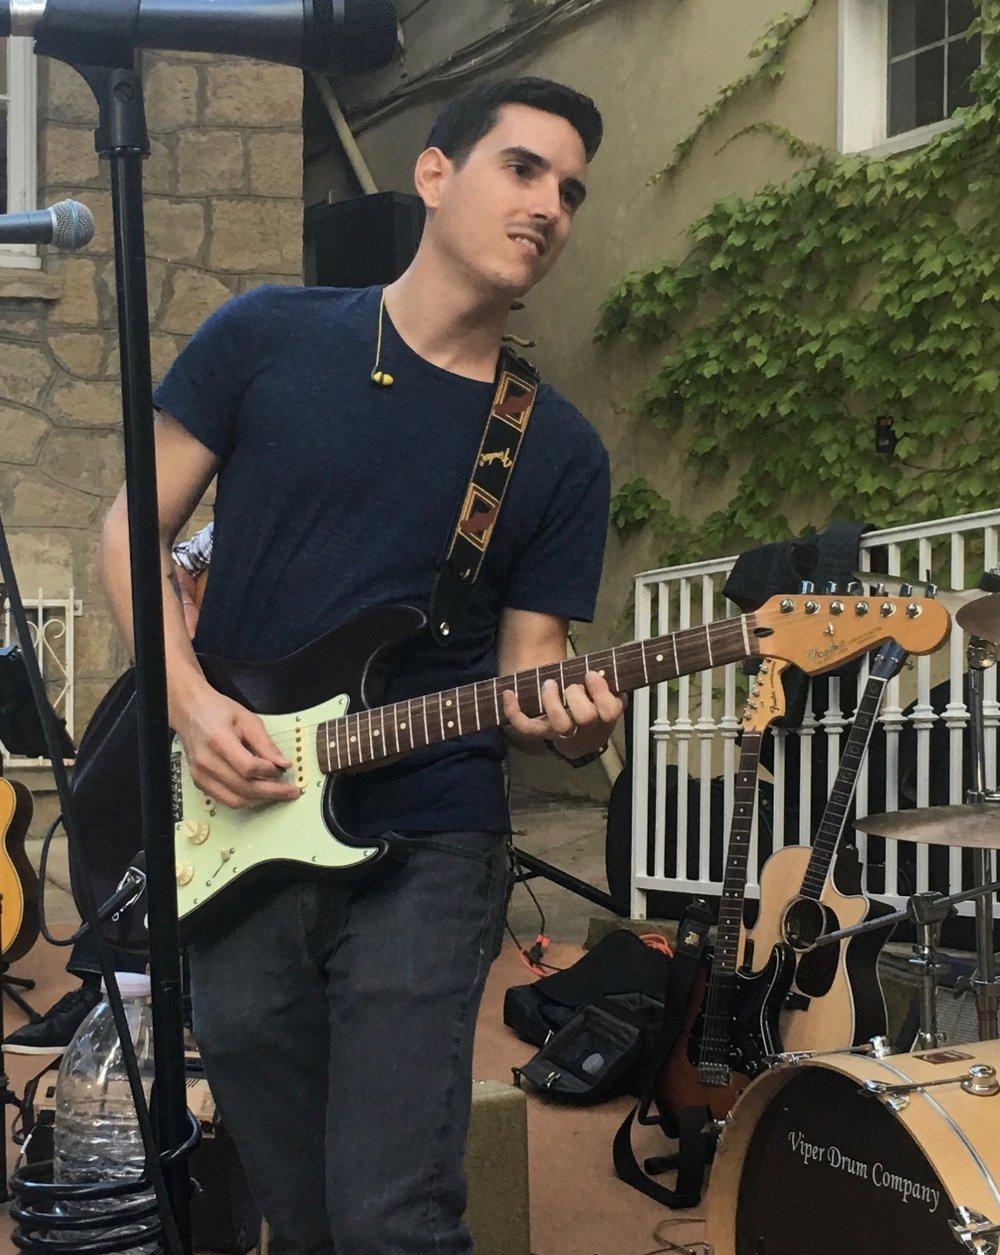 Josh, Lead Singer and Guitarist